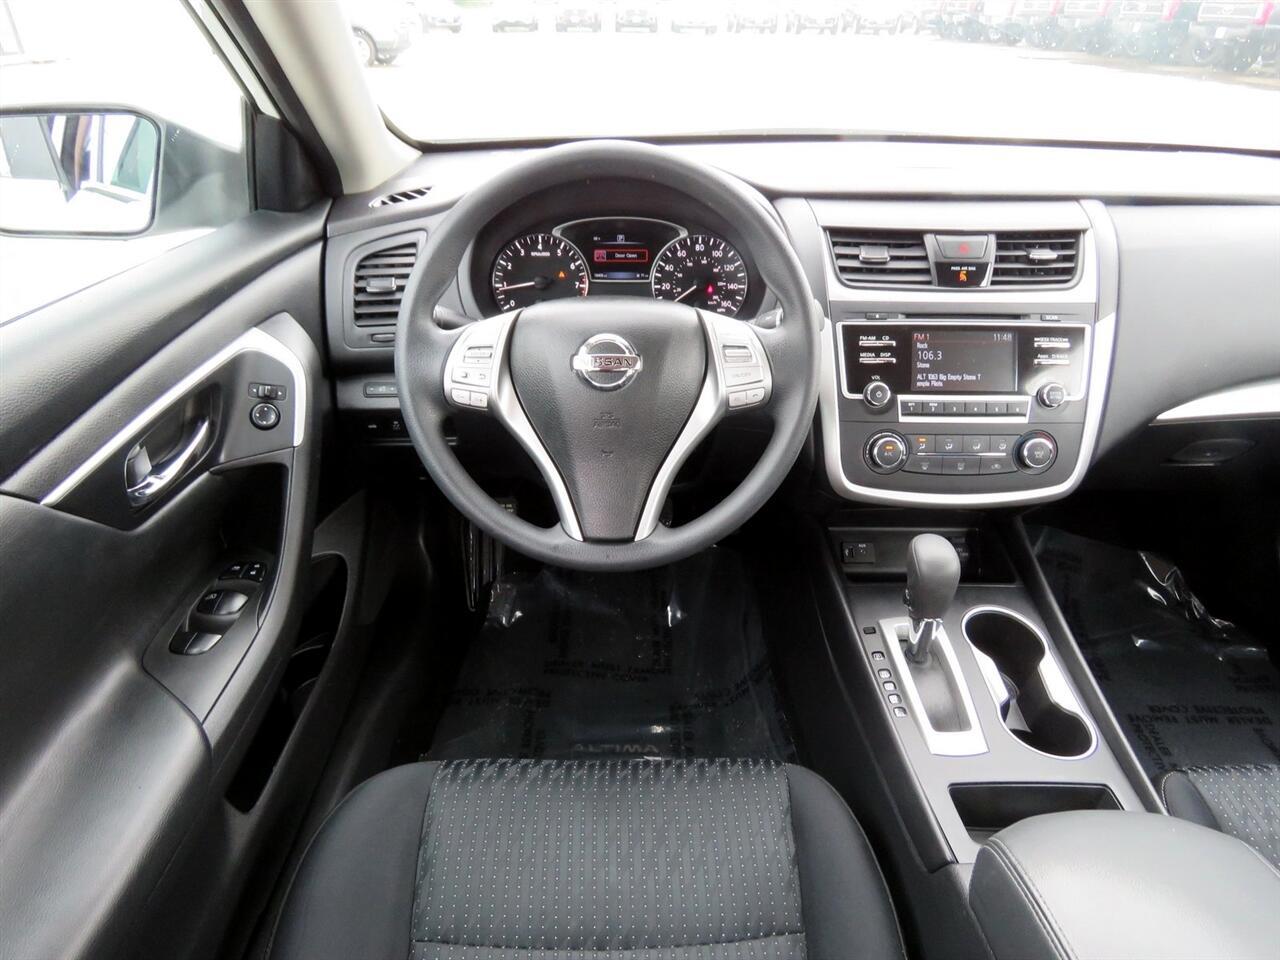 2016 Nissan Altima S